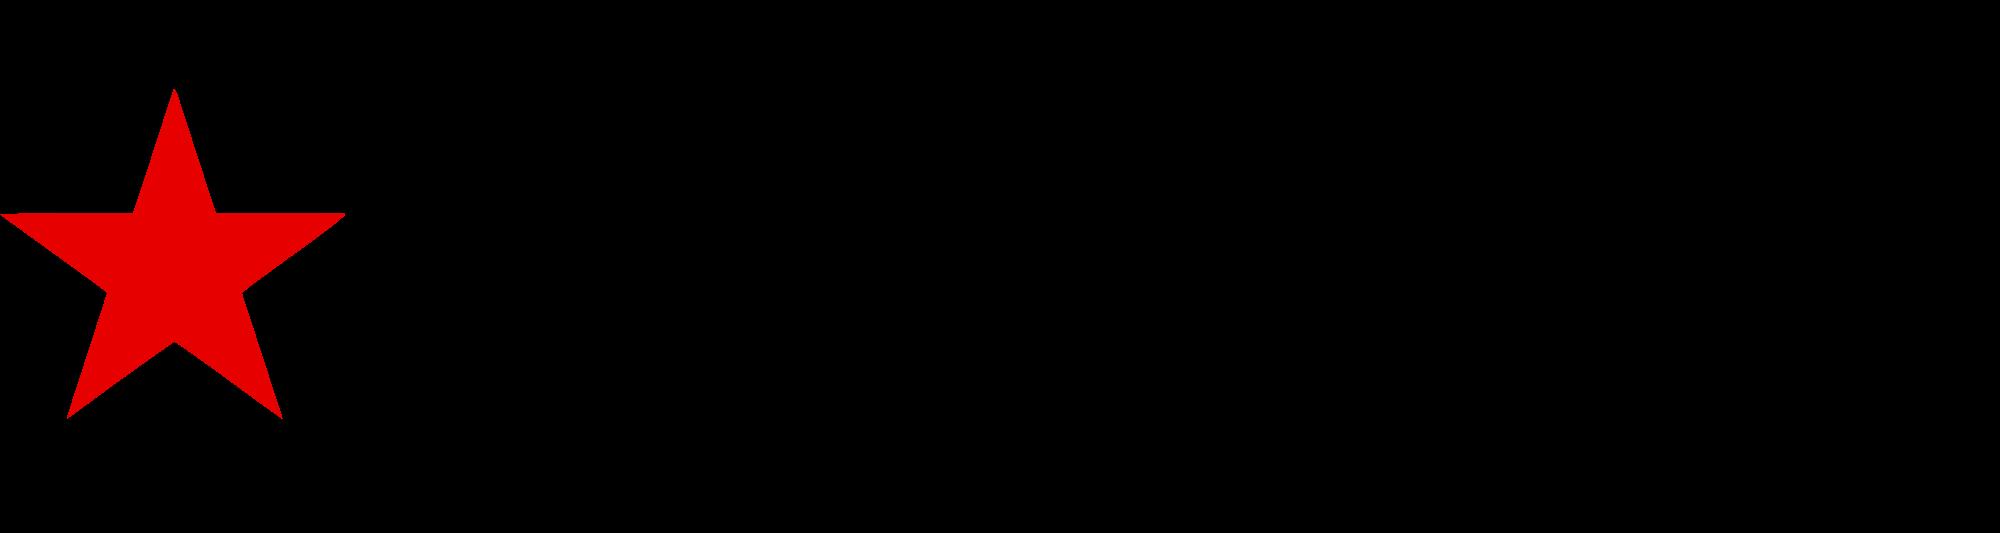 15 Macy's Logo.png